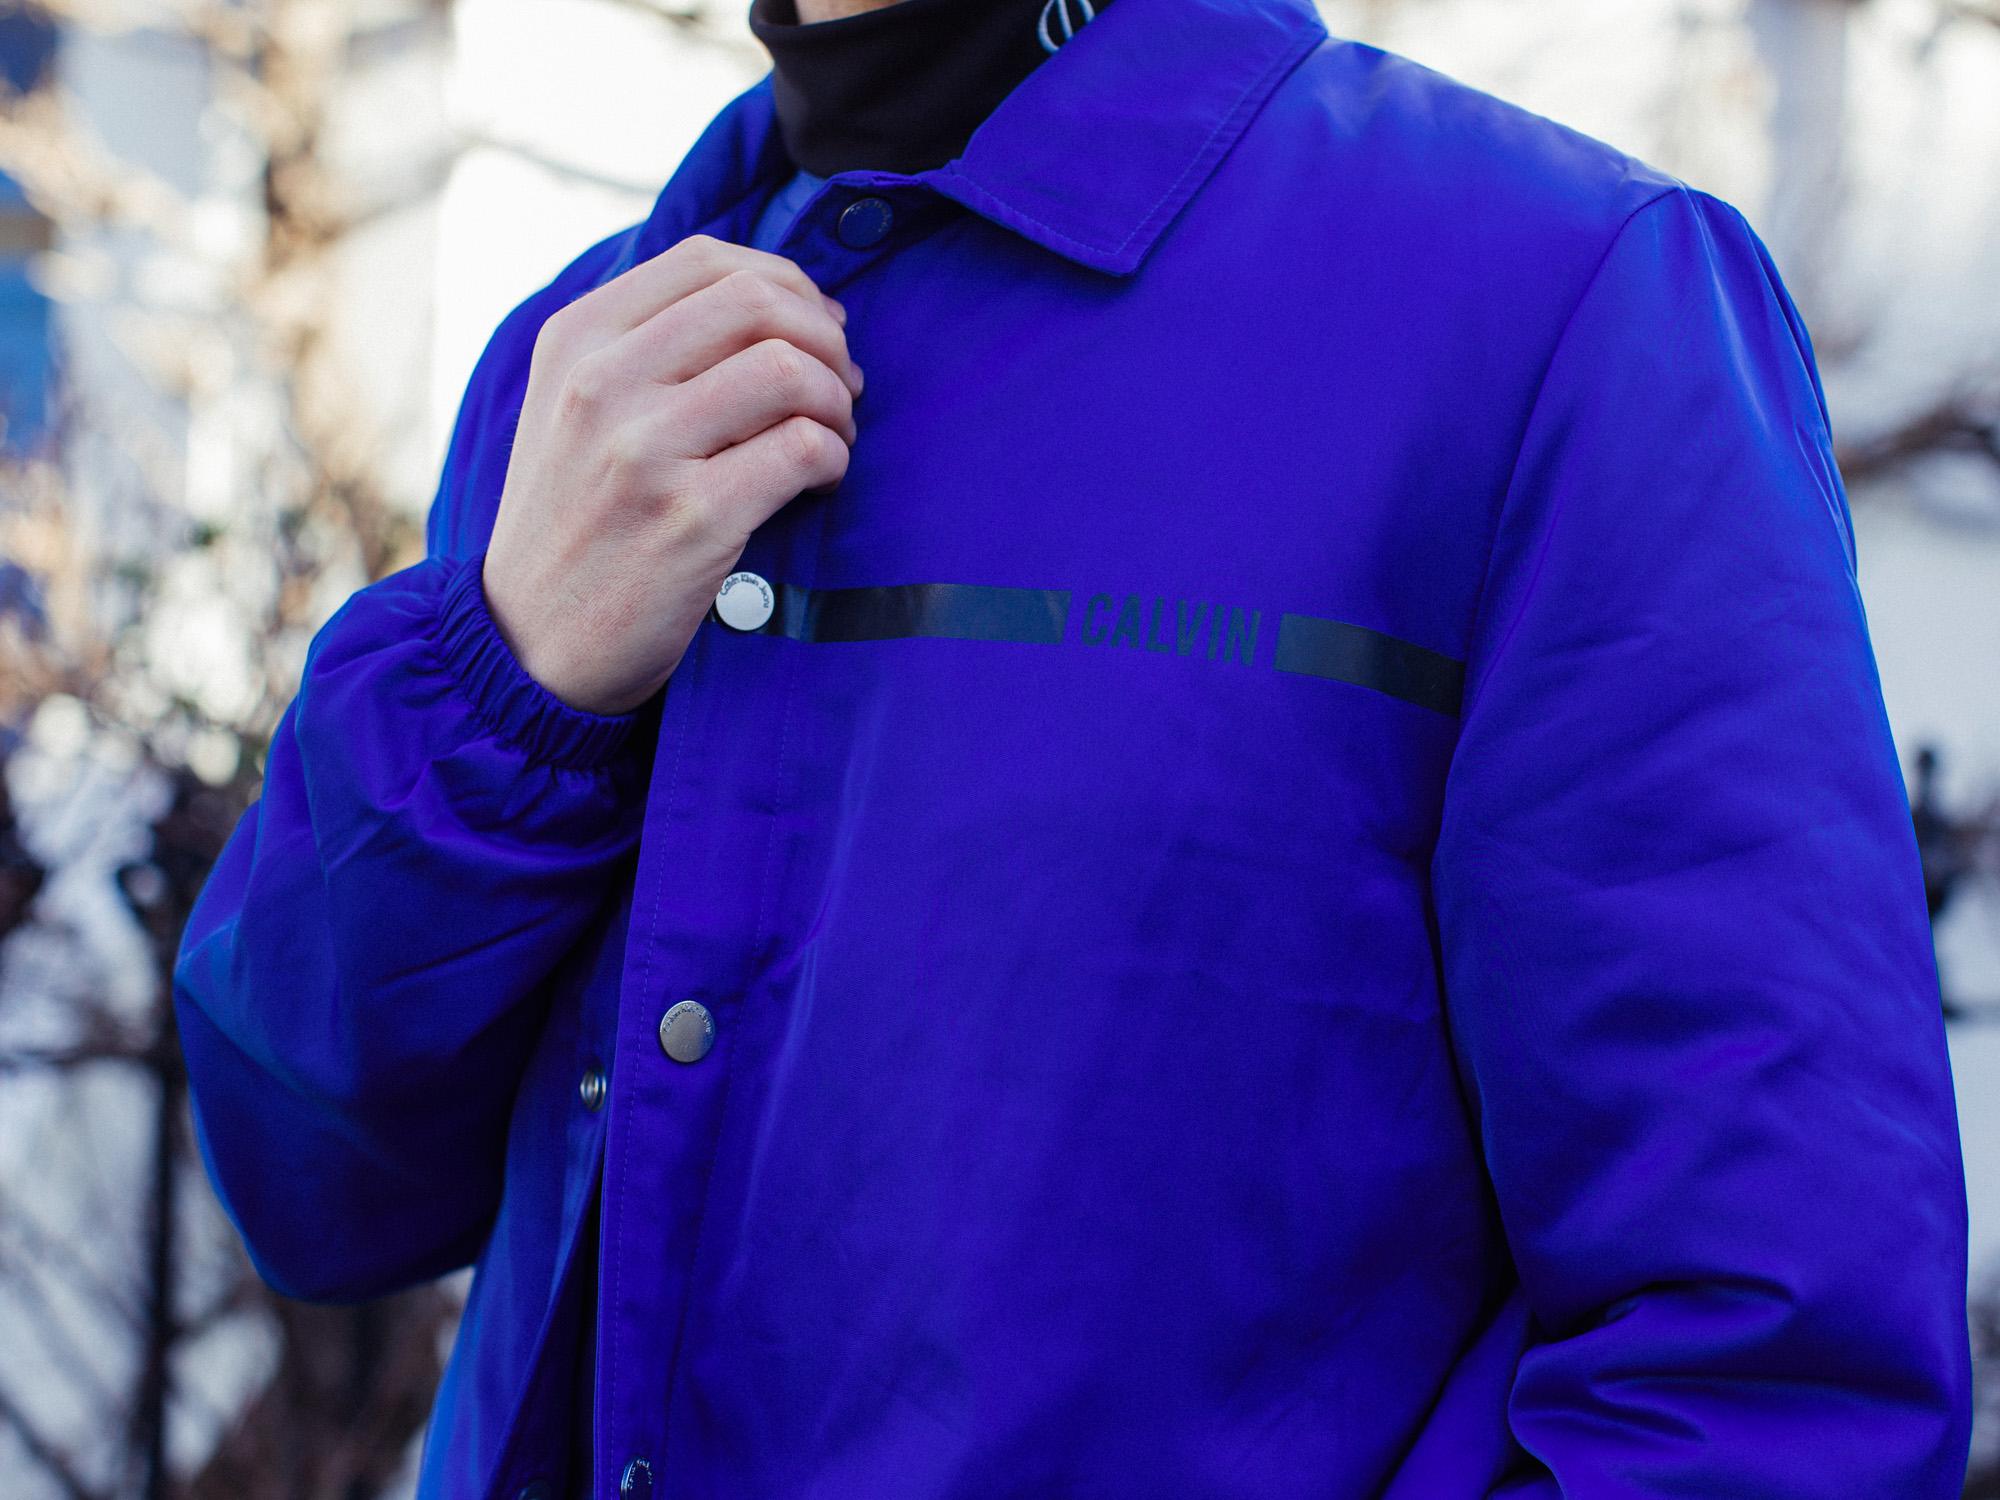 calvin-klein-coach-jacket-blue-layers-mfh-3-2